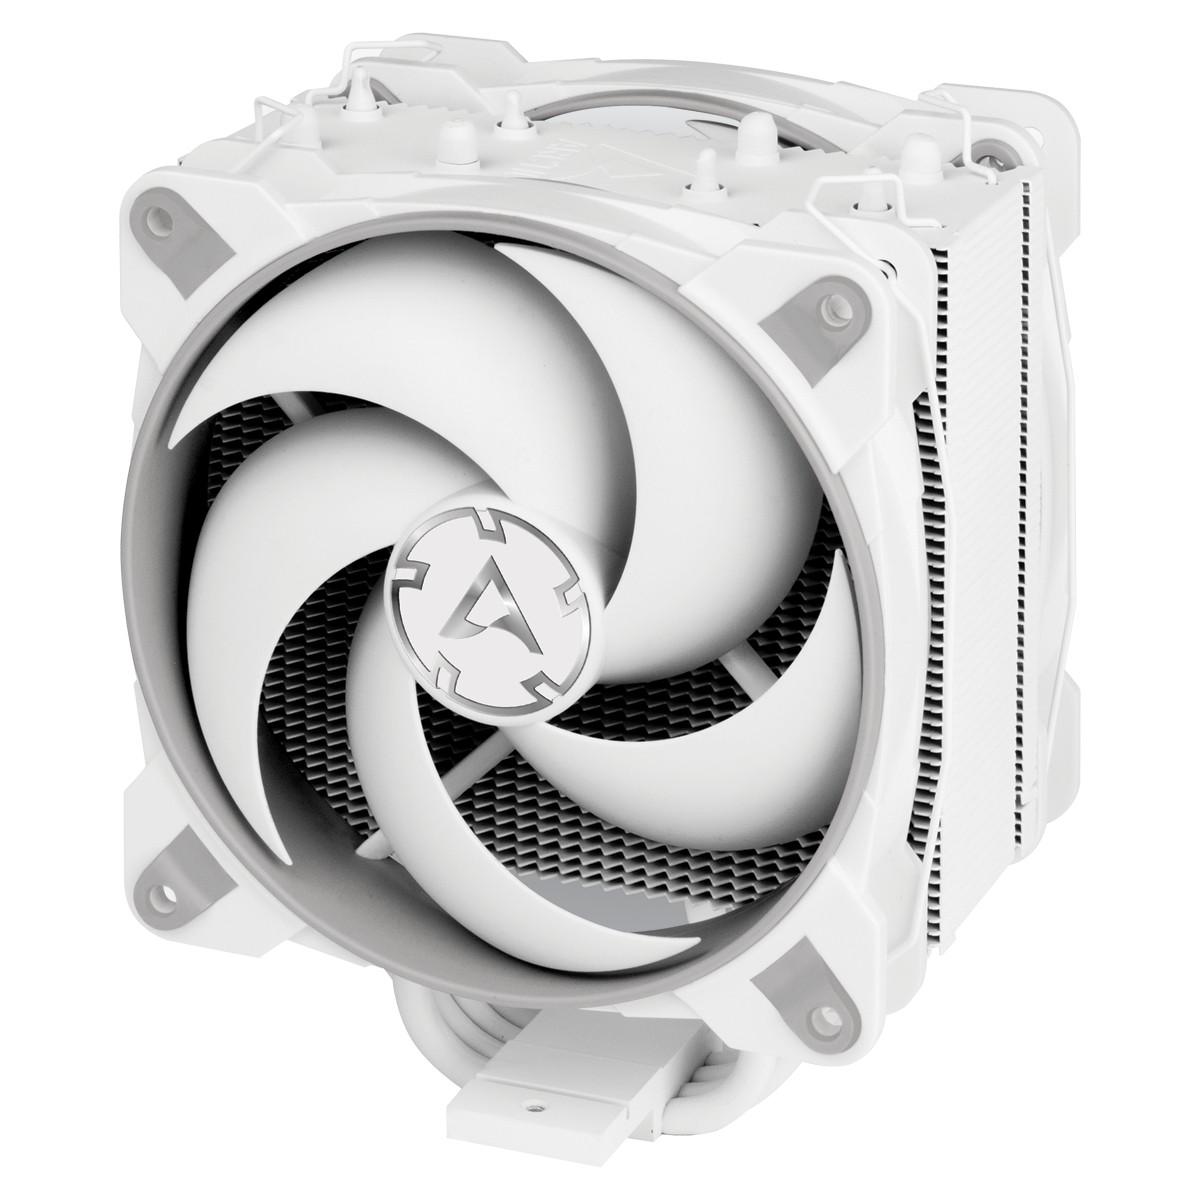 ARCTIC Freezer 34 eSports DUO - Tower CPU Cooler with BioniX P-Series Fans in Push-Pull-Configuration Processor Koeler 12 cm Grijs, Wit 1 stuk(s)